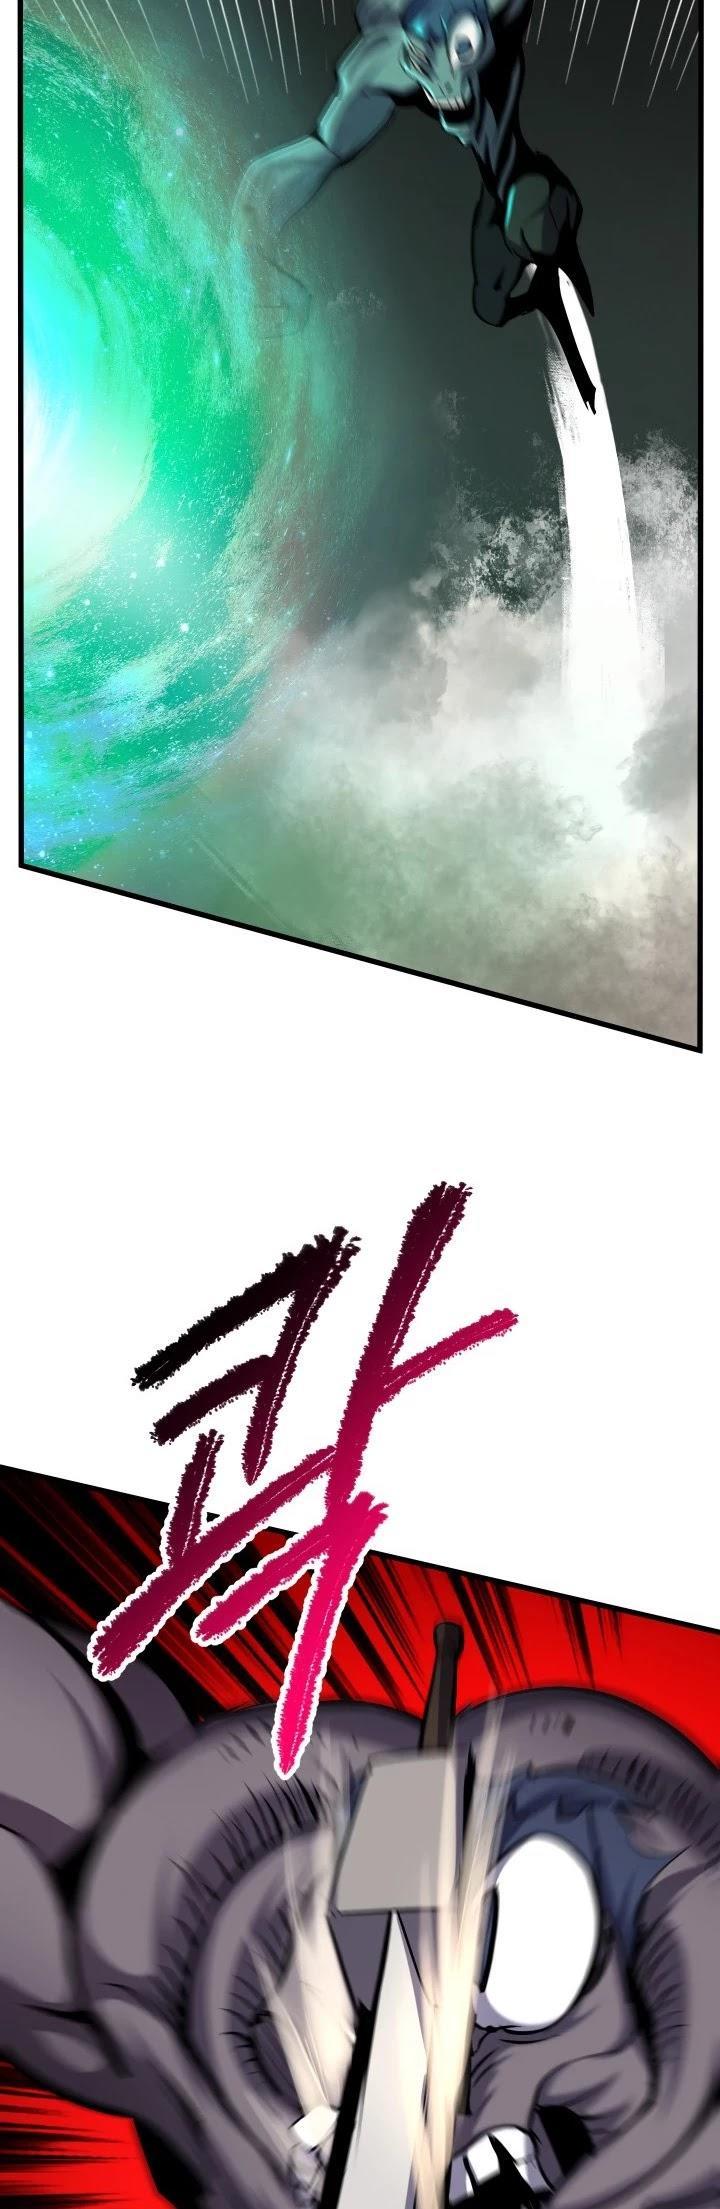 Survival Story Of A Sword King In A Fantasy World Chapter 44 page 27 - Mangakakalots.com